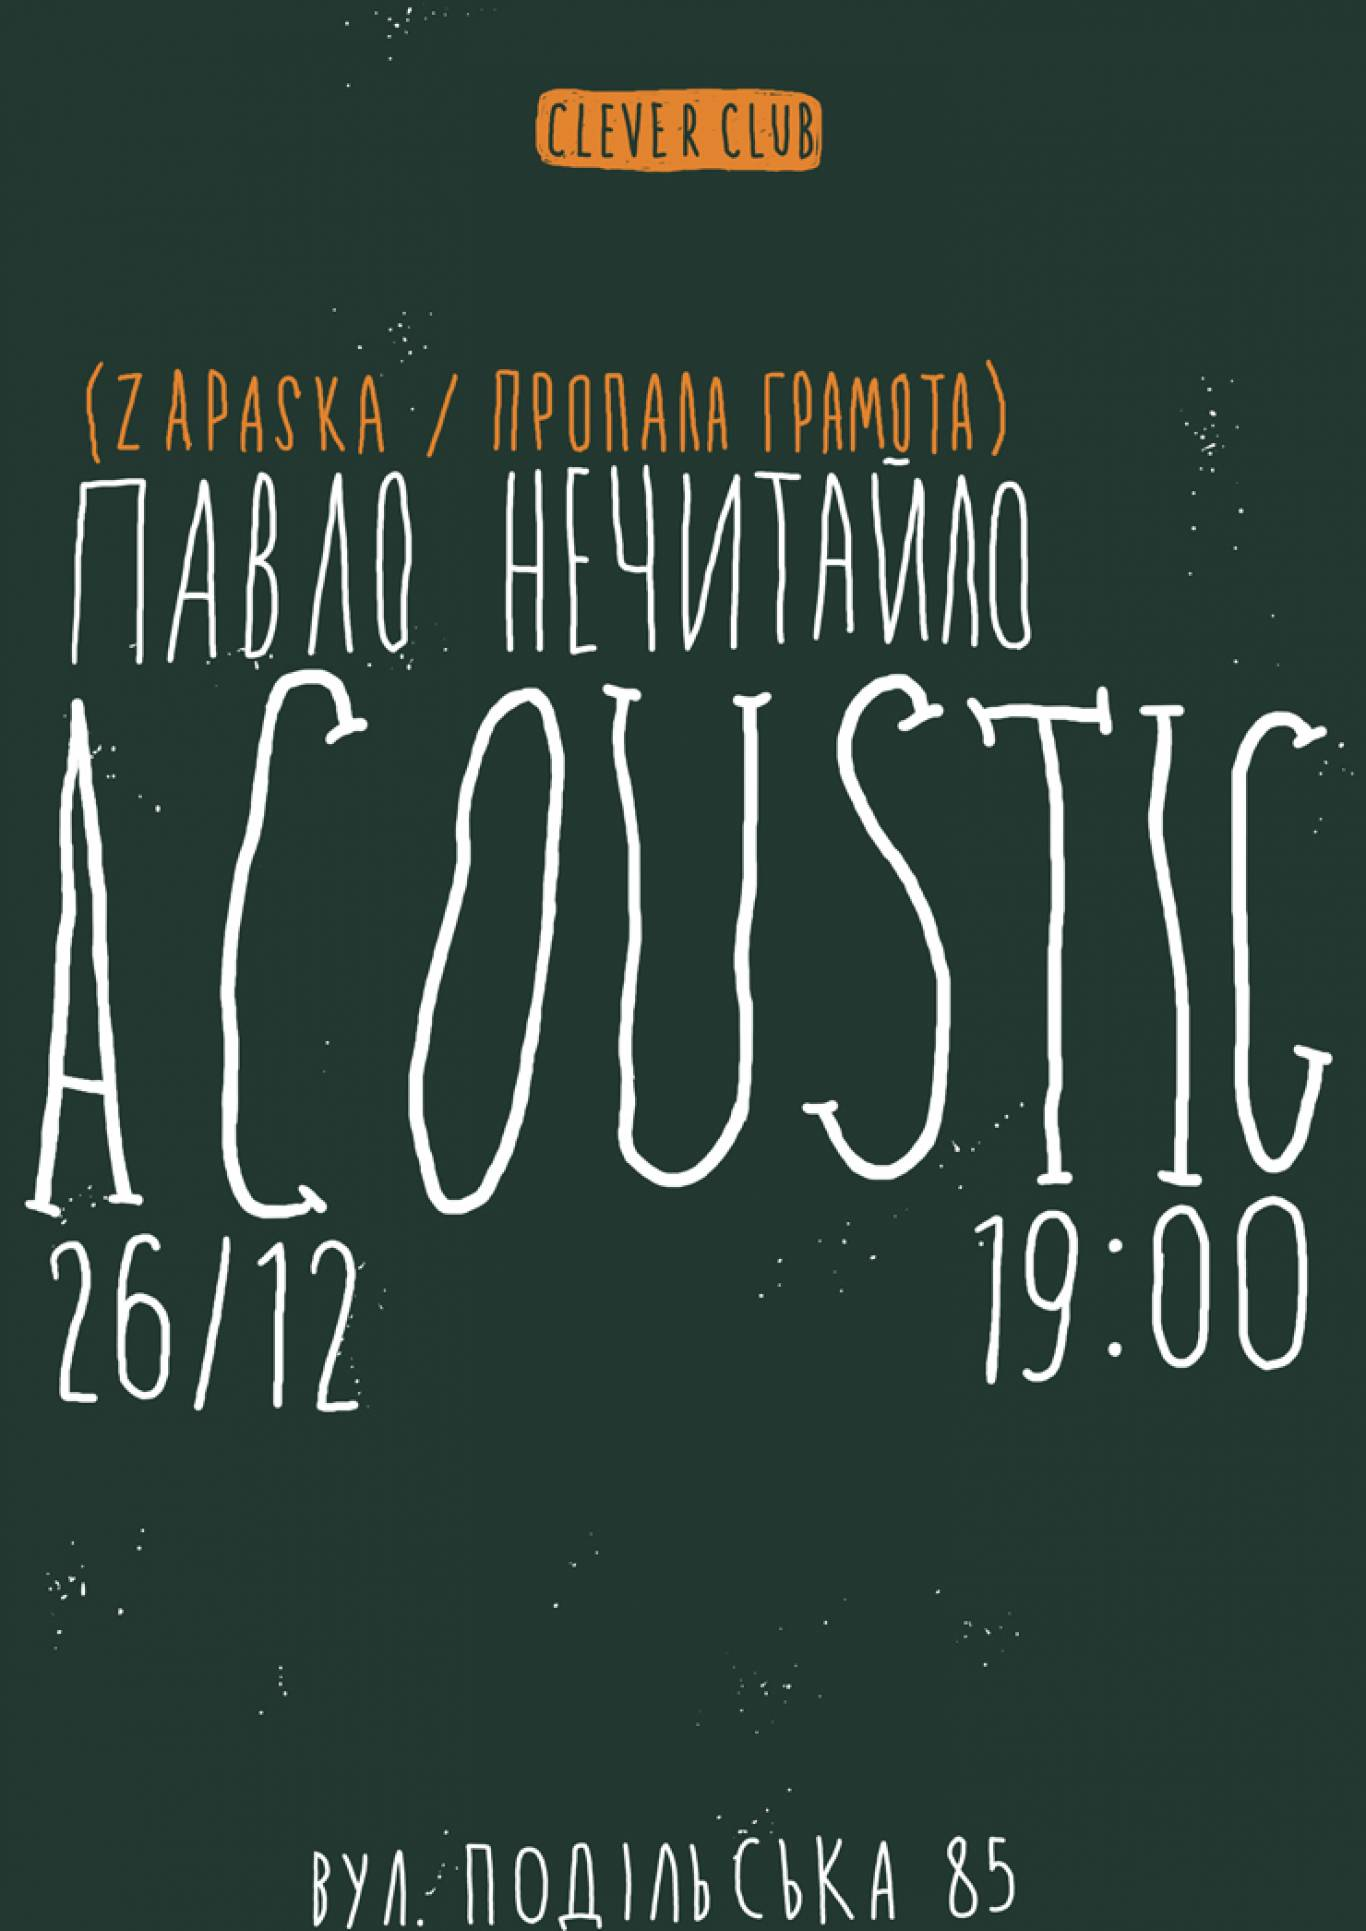 Павло Нечитайло - акустичний концерт